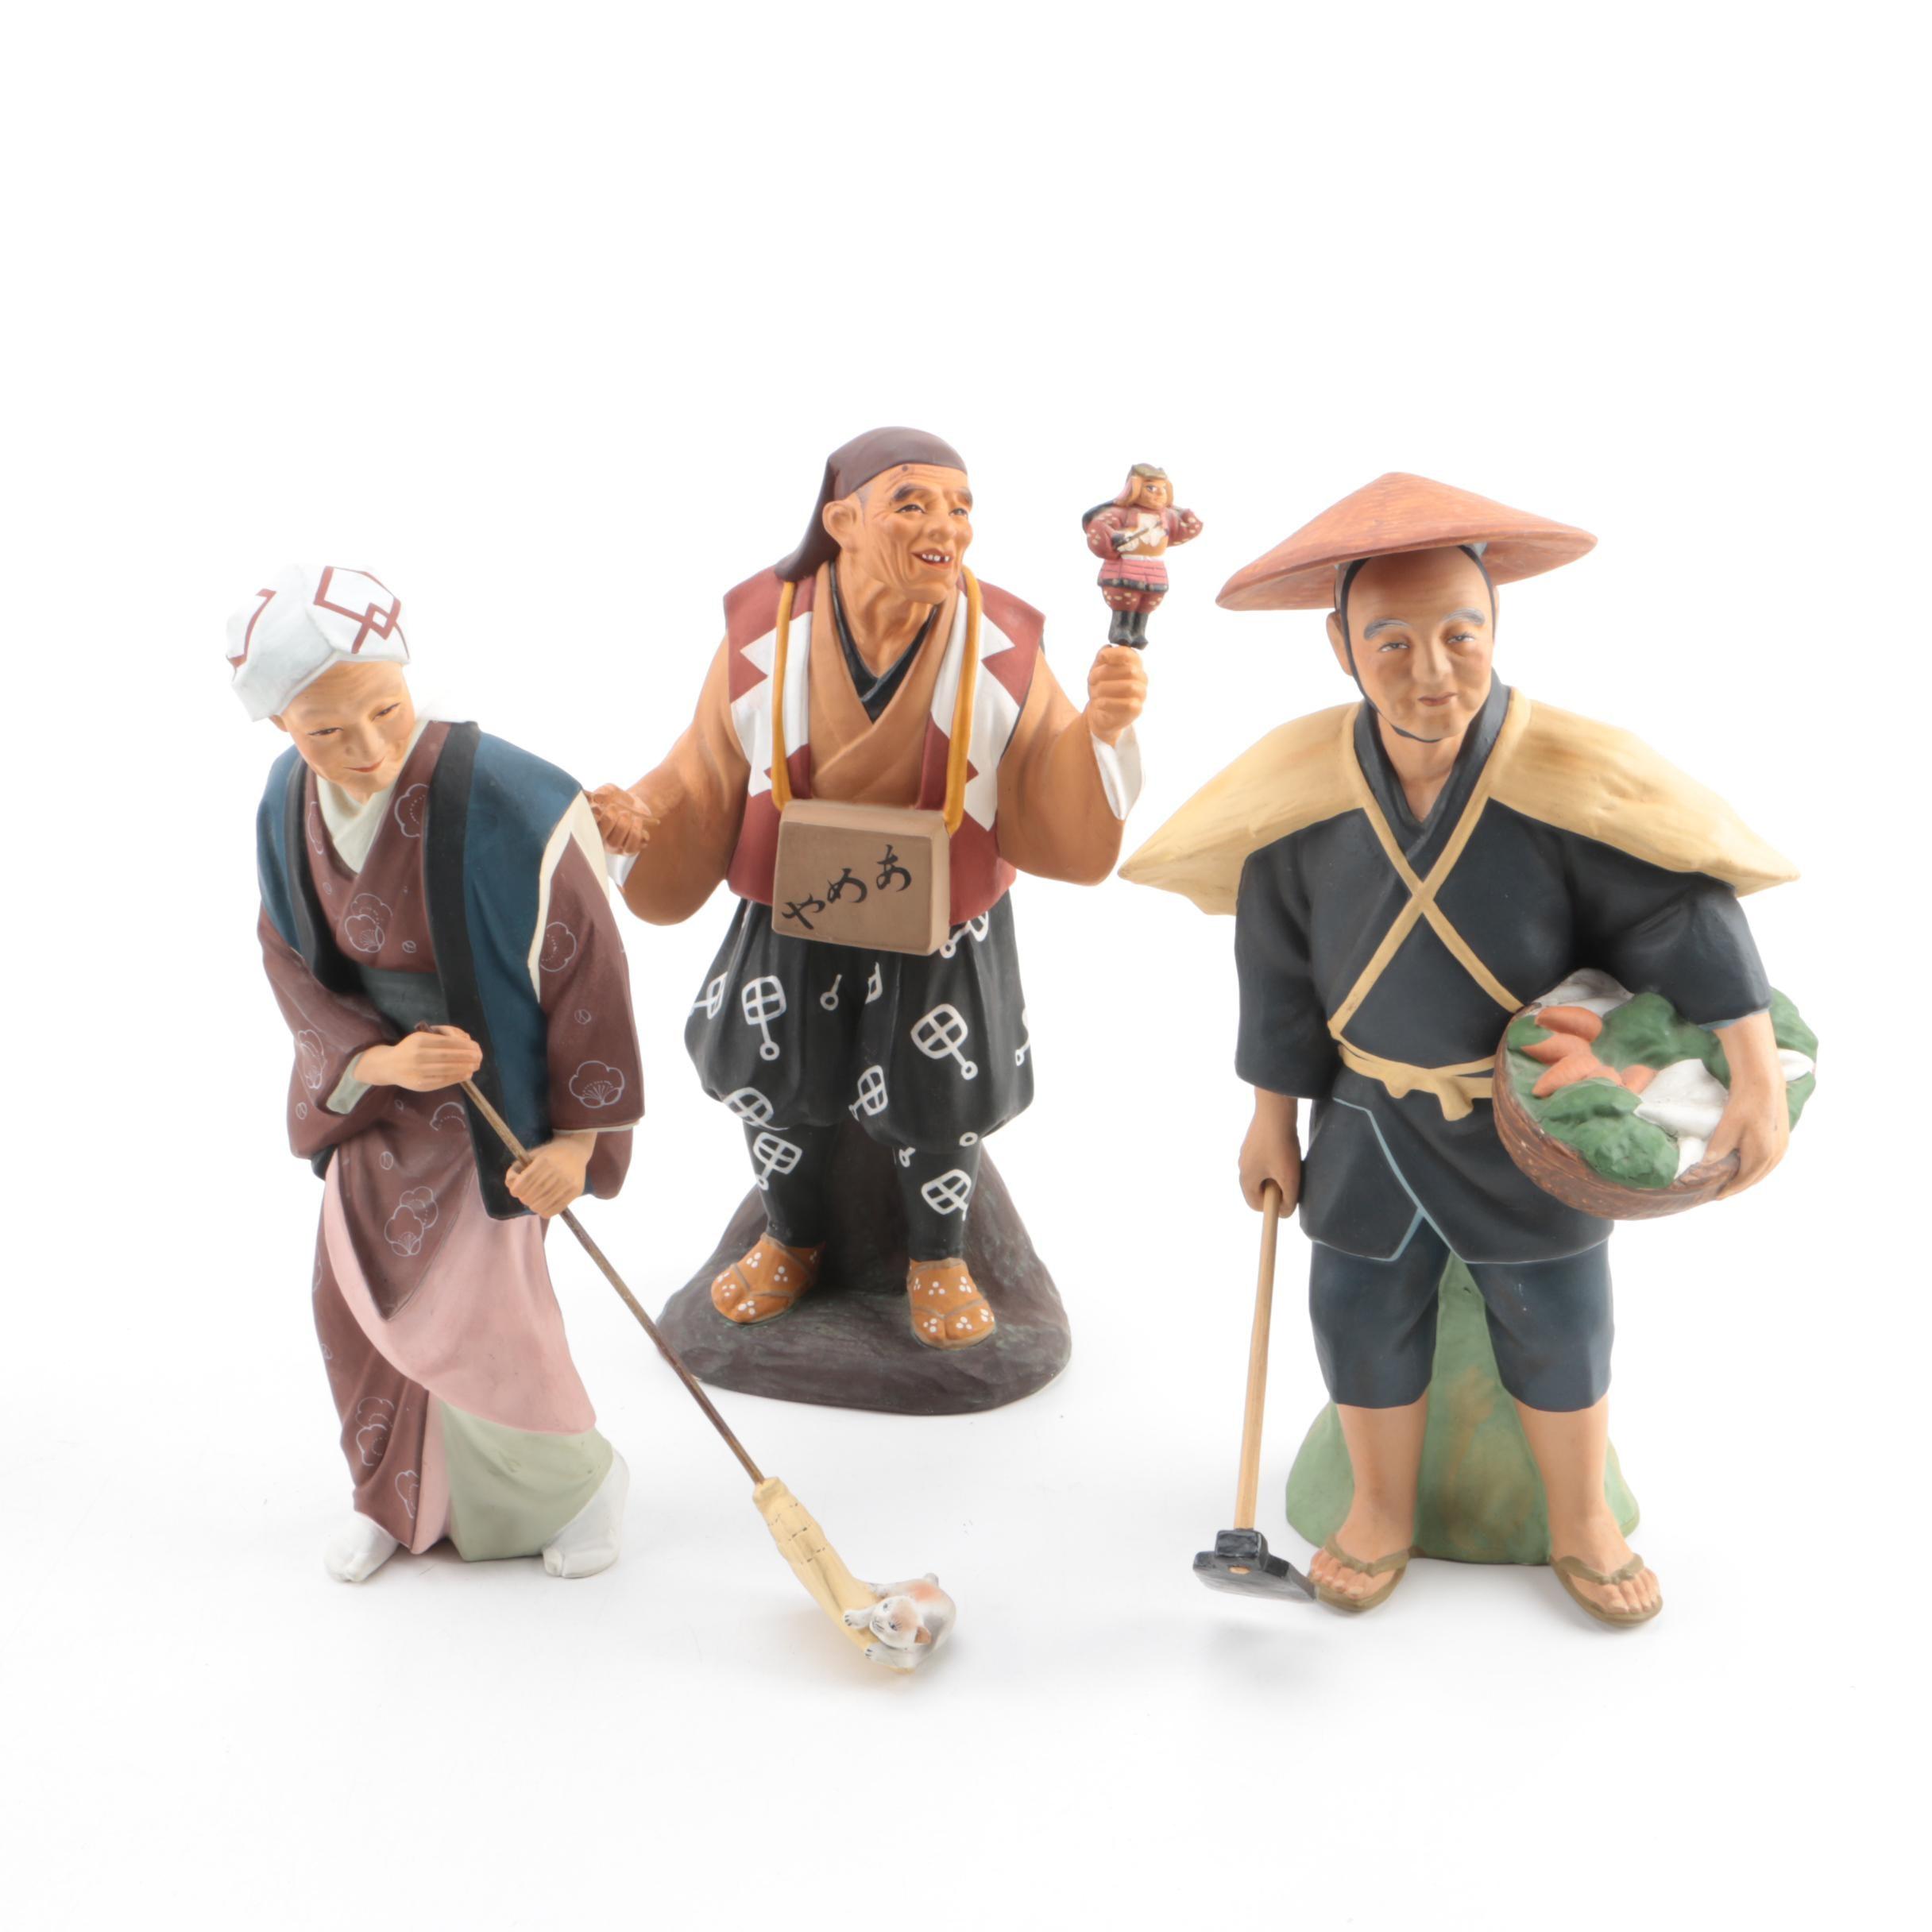 Japanese Hakata Urasaki Dolls